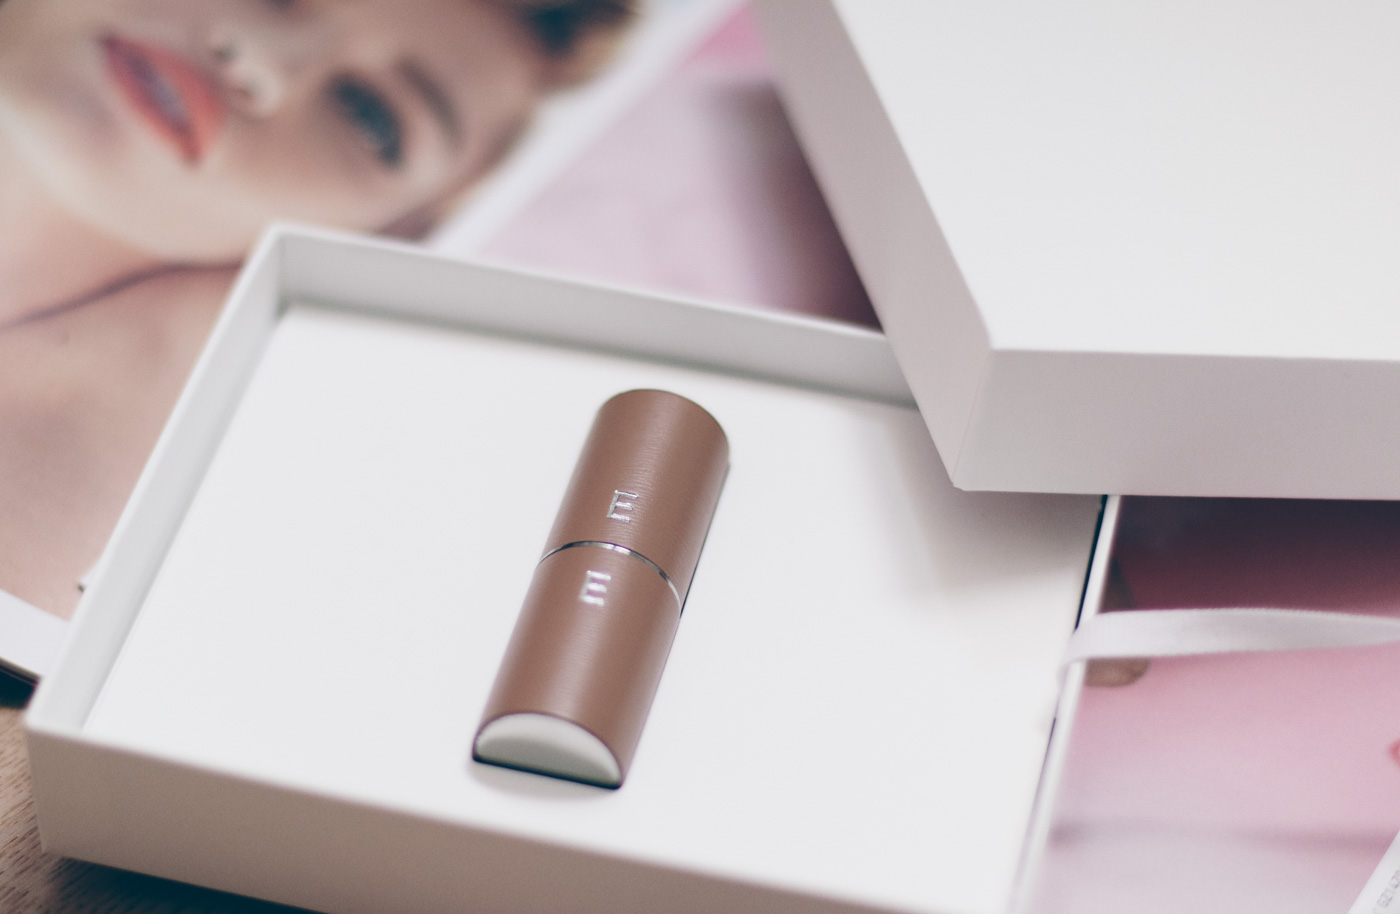 La Bouche Rouge: A Sustainable Lipstick Brand